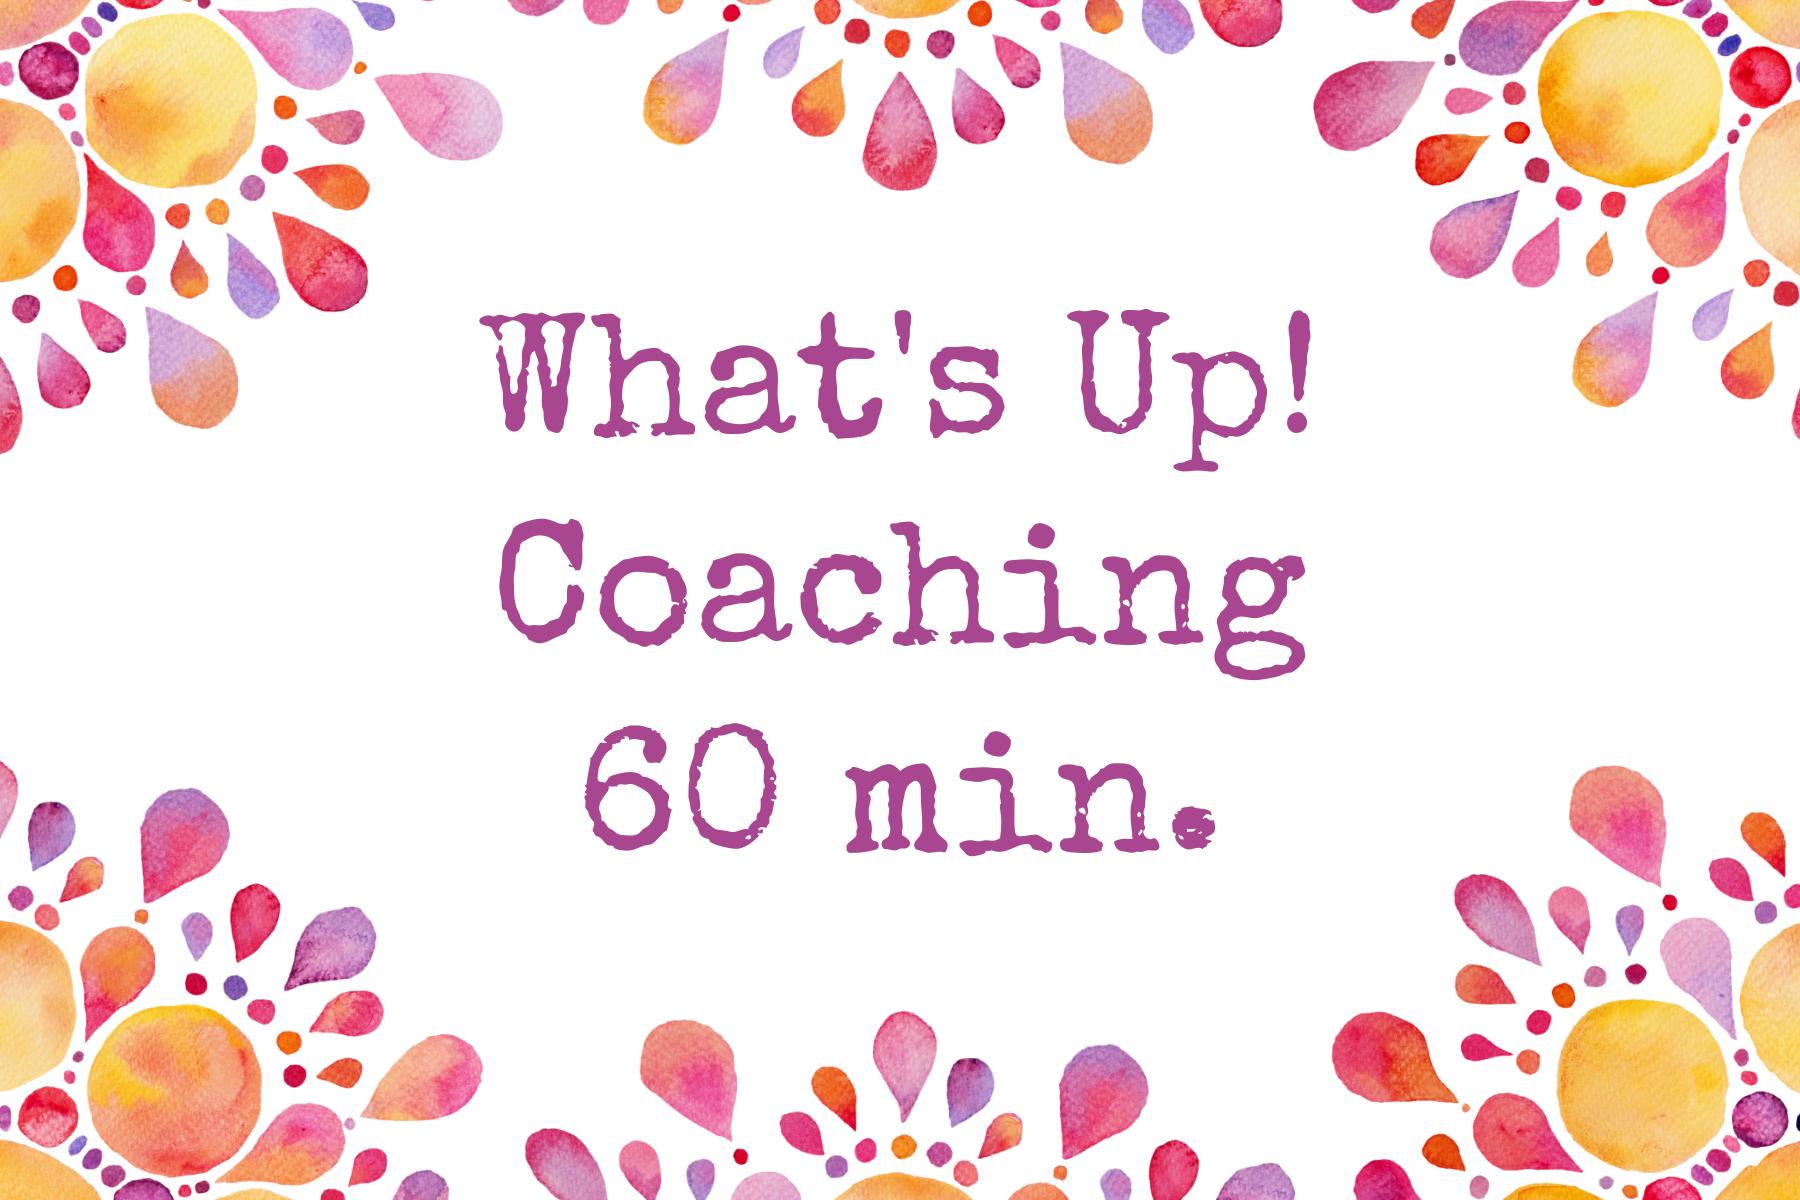 what's up coaching via whatsapp